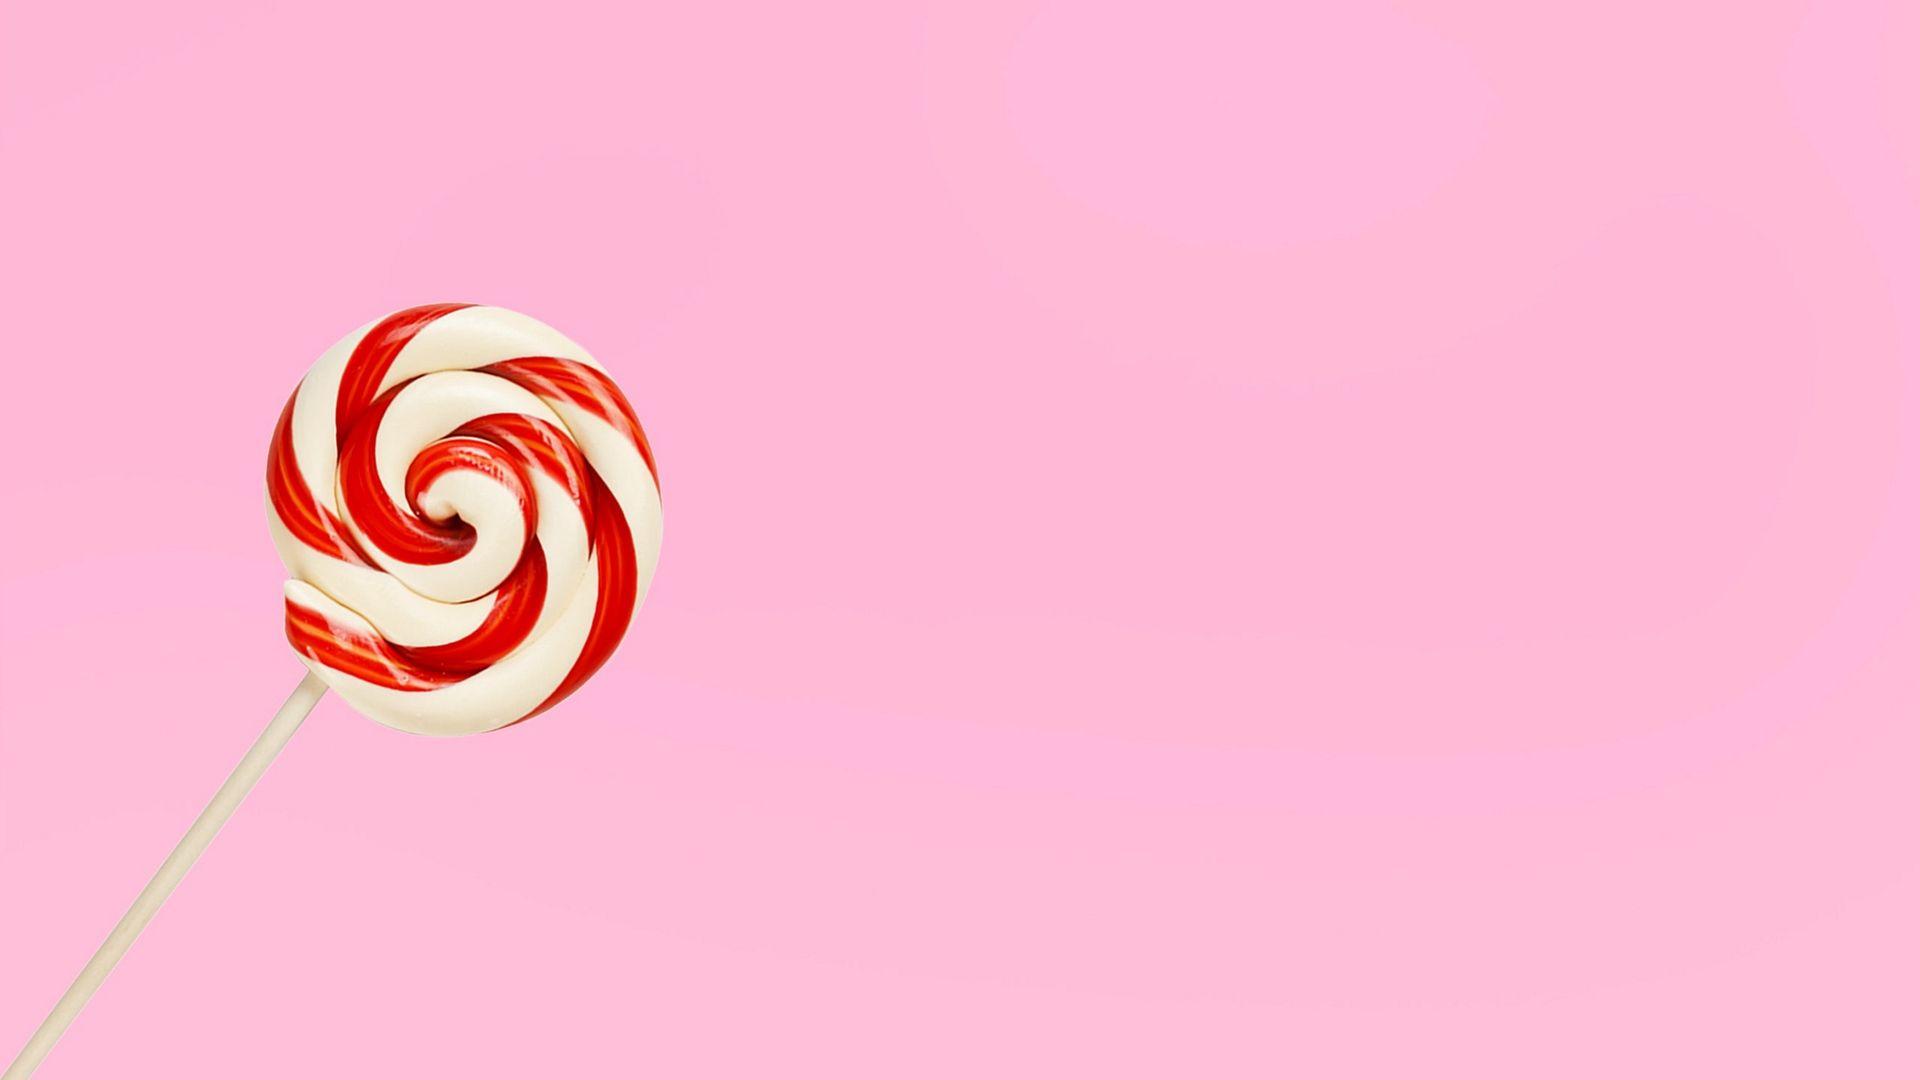 Lollipop And Light Pink Minimal HD Wallpaper